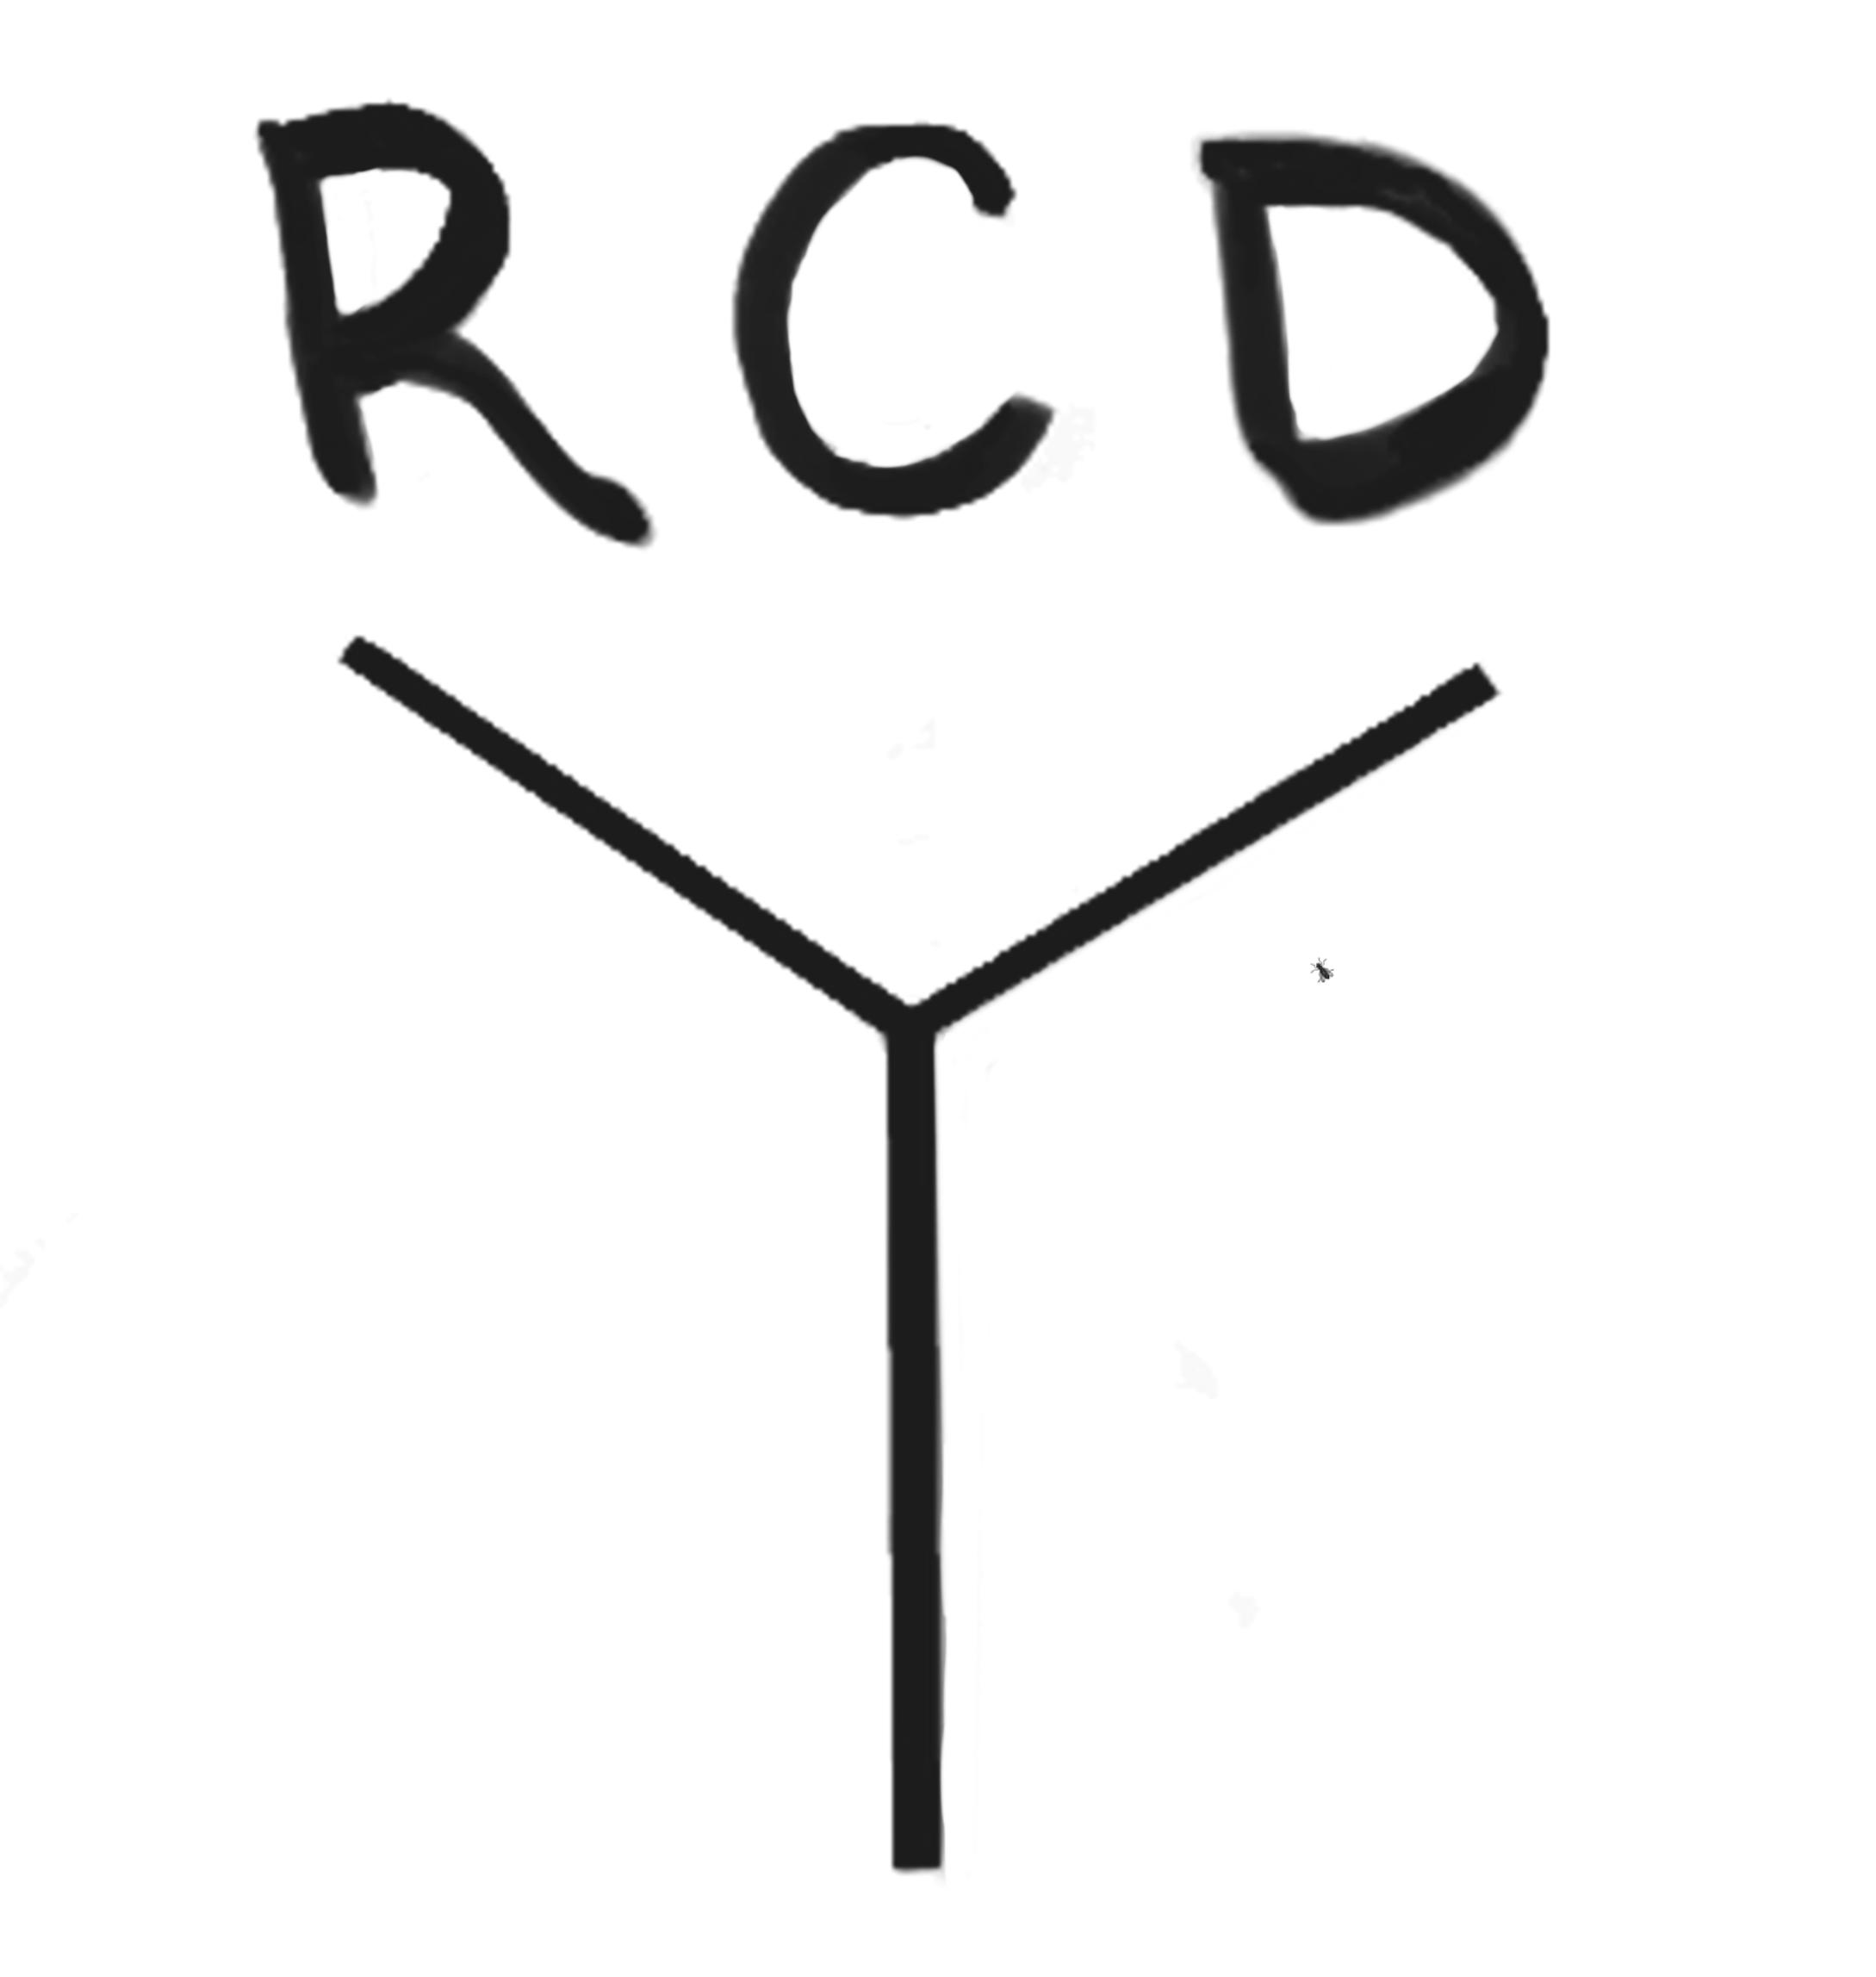 rcdlogofinished052517